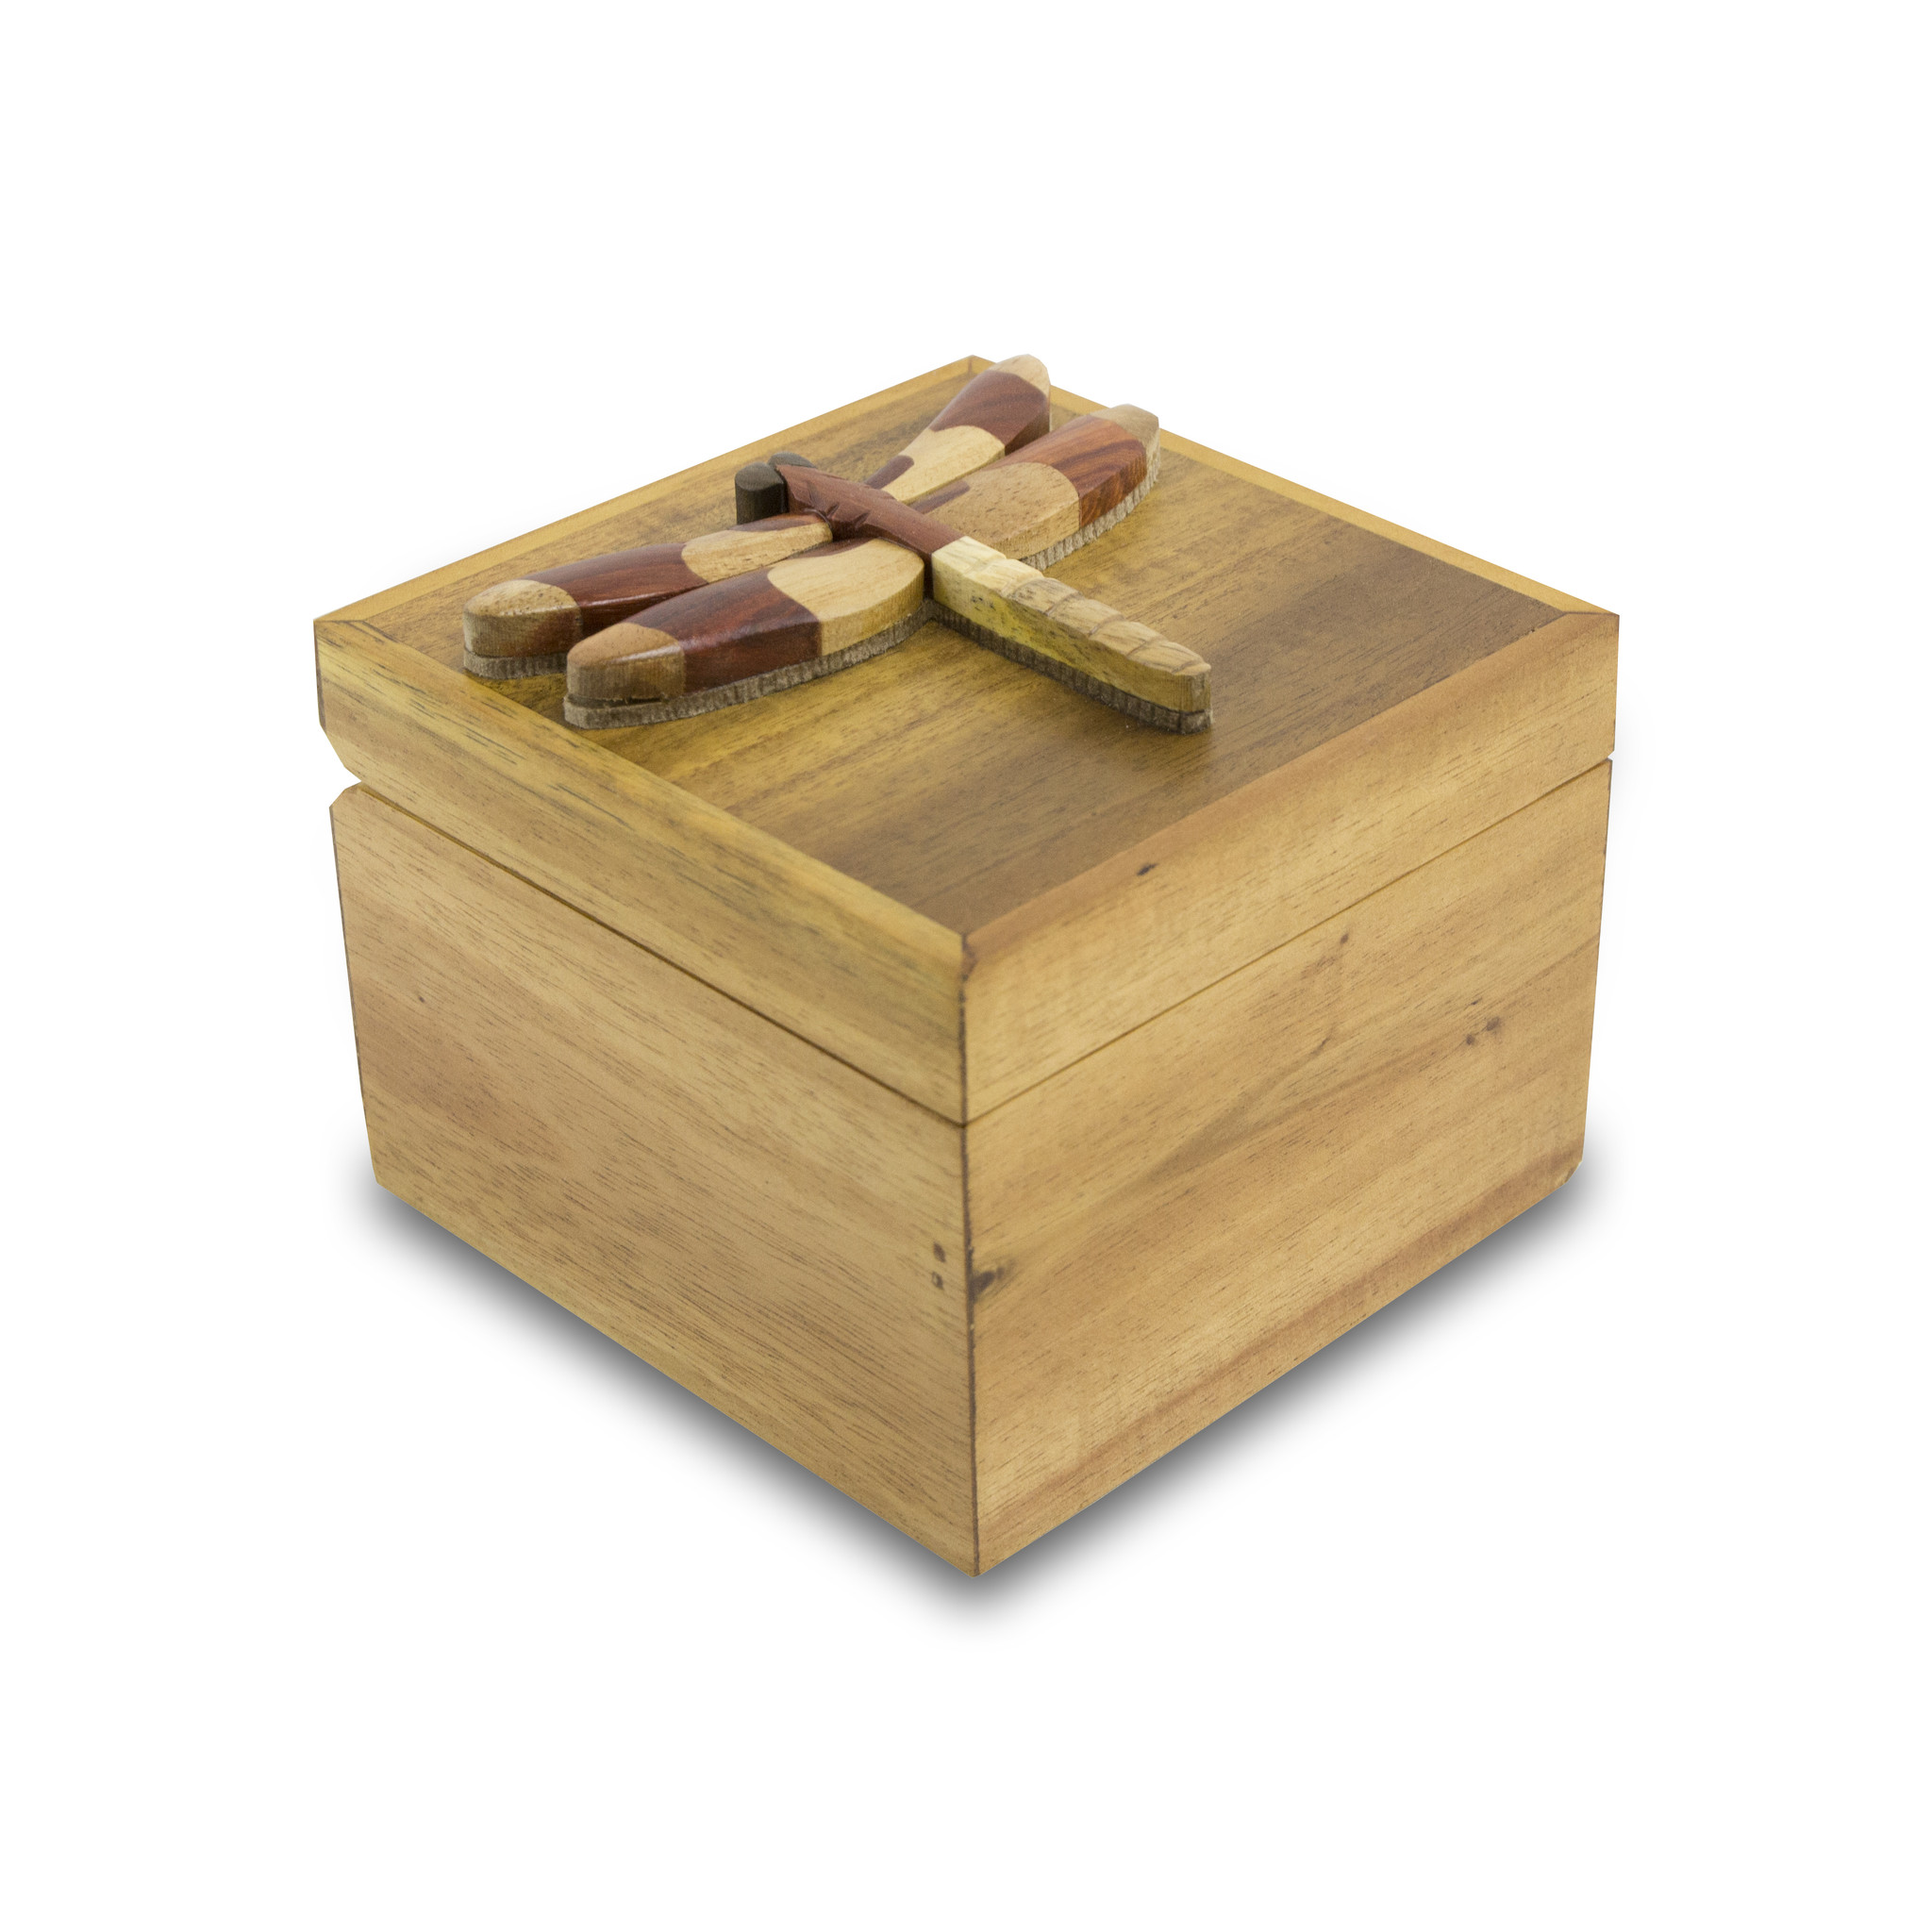 NEW! Intarsia Wood Cremation Keepsake Box - Dragonfly